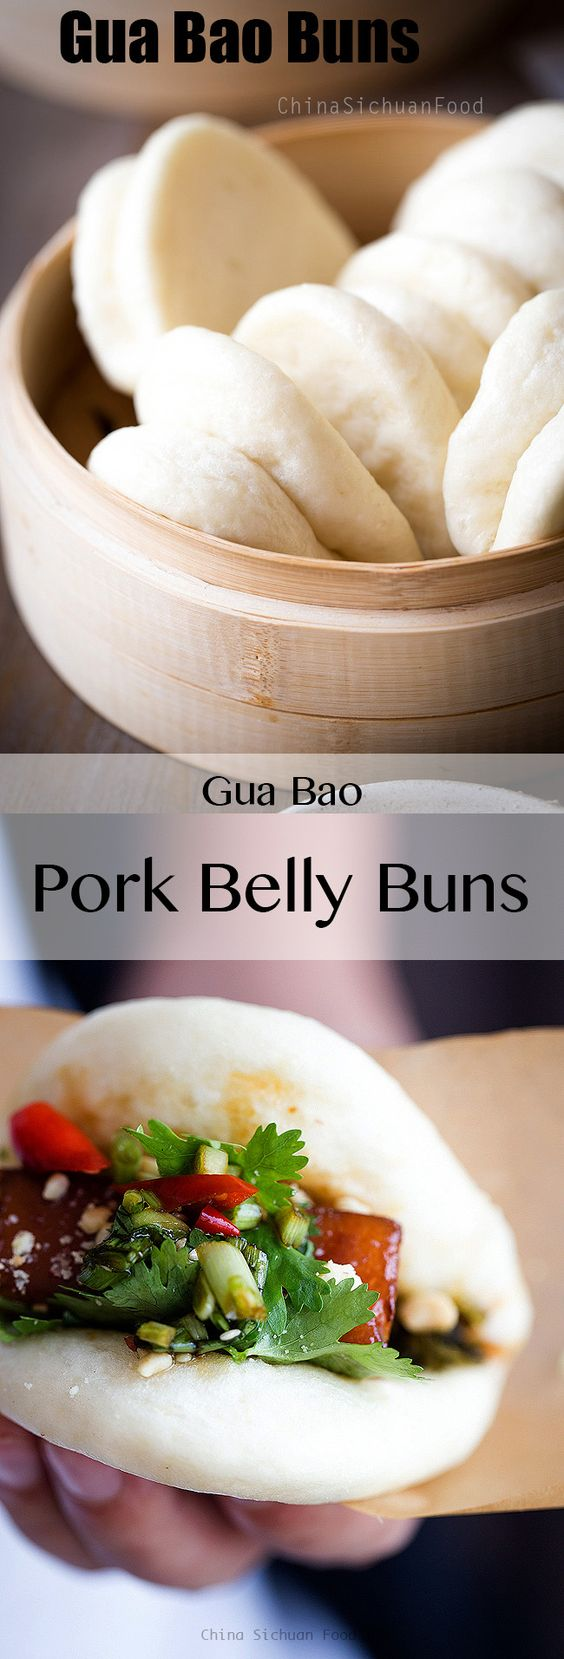 Gua Bao